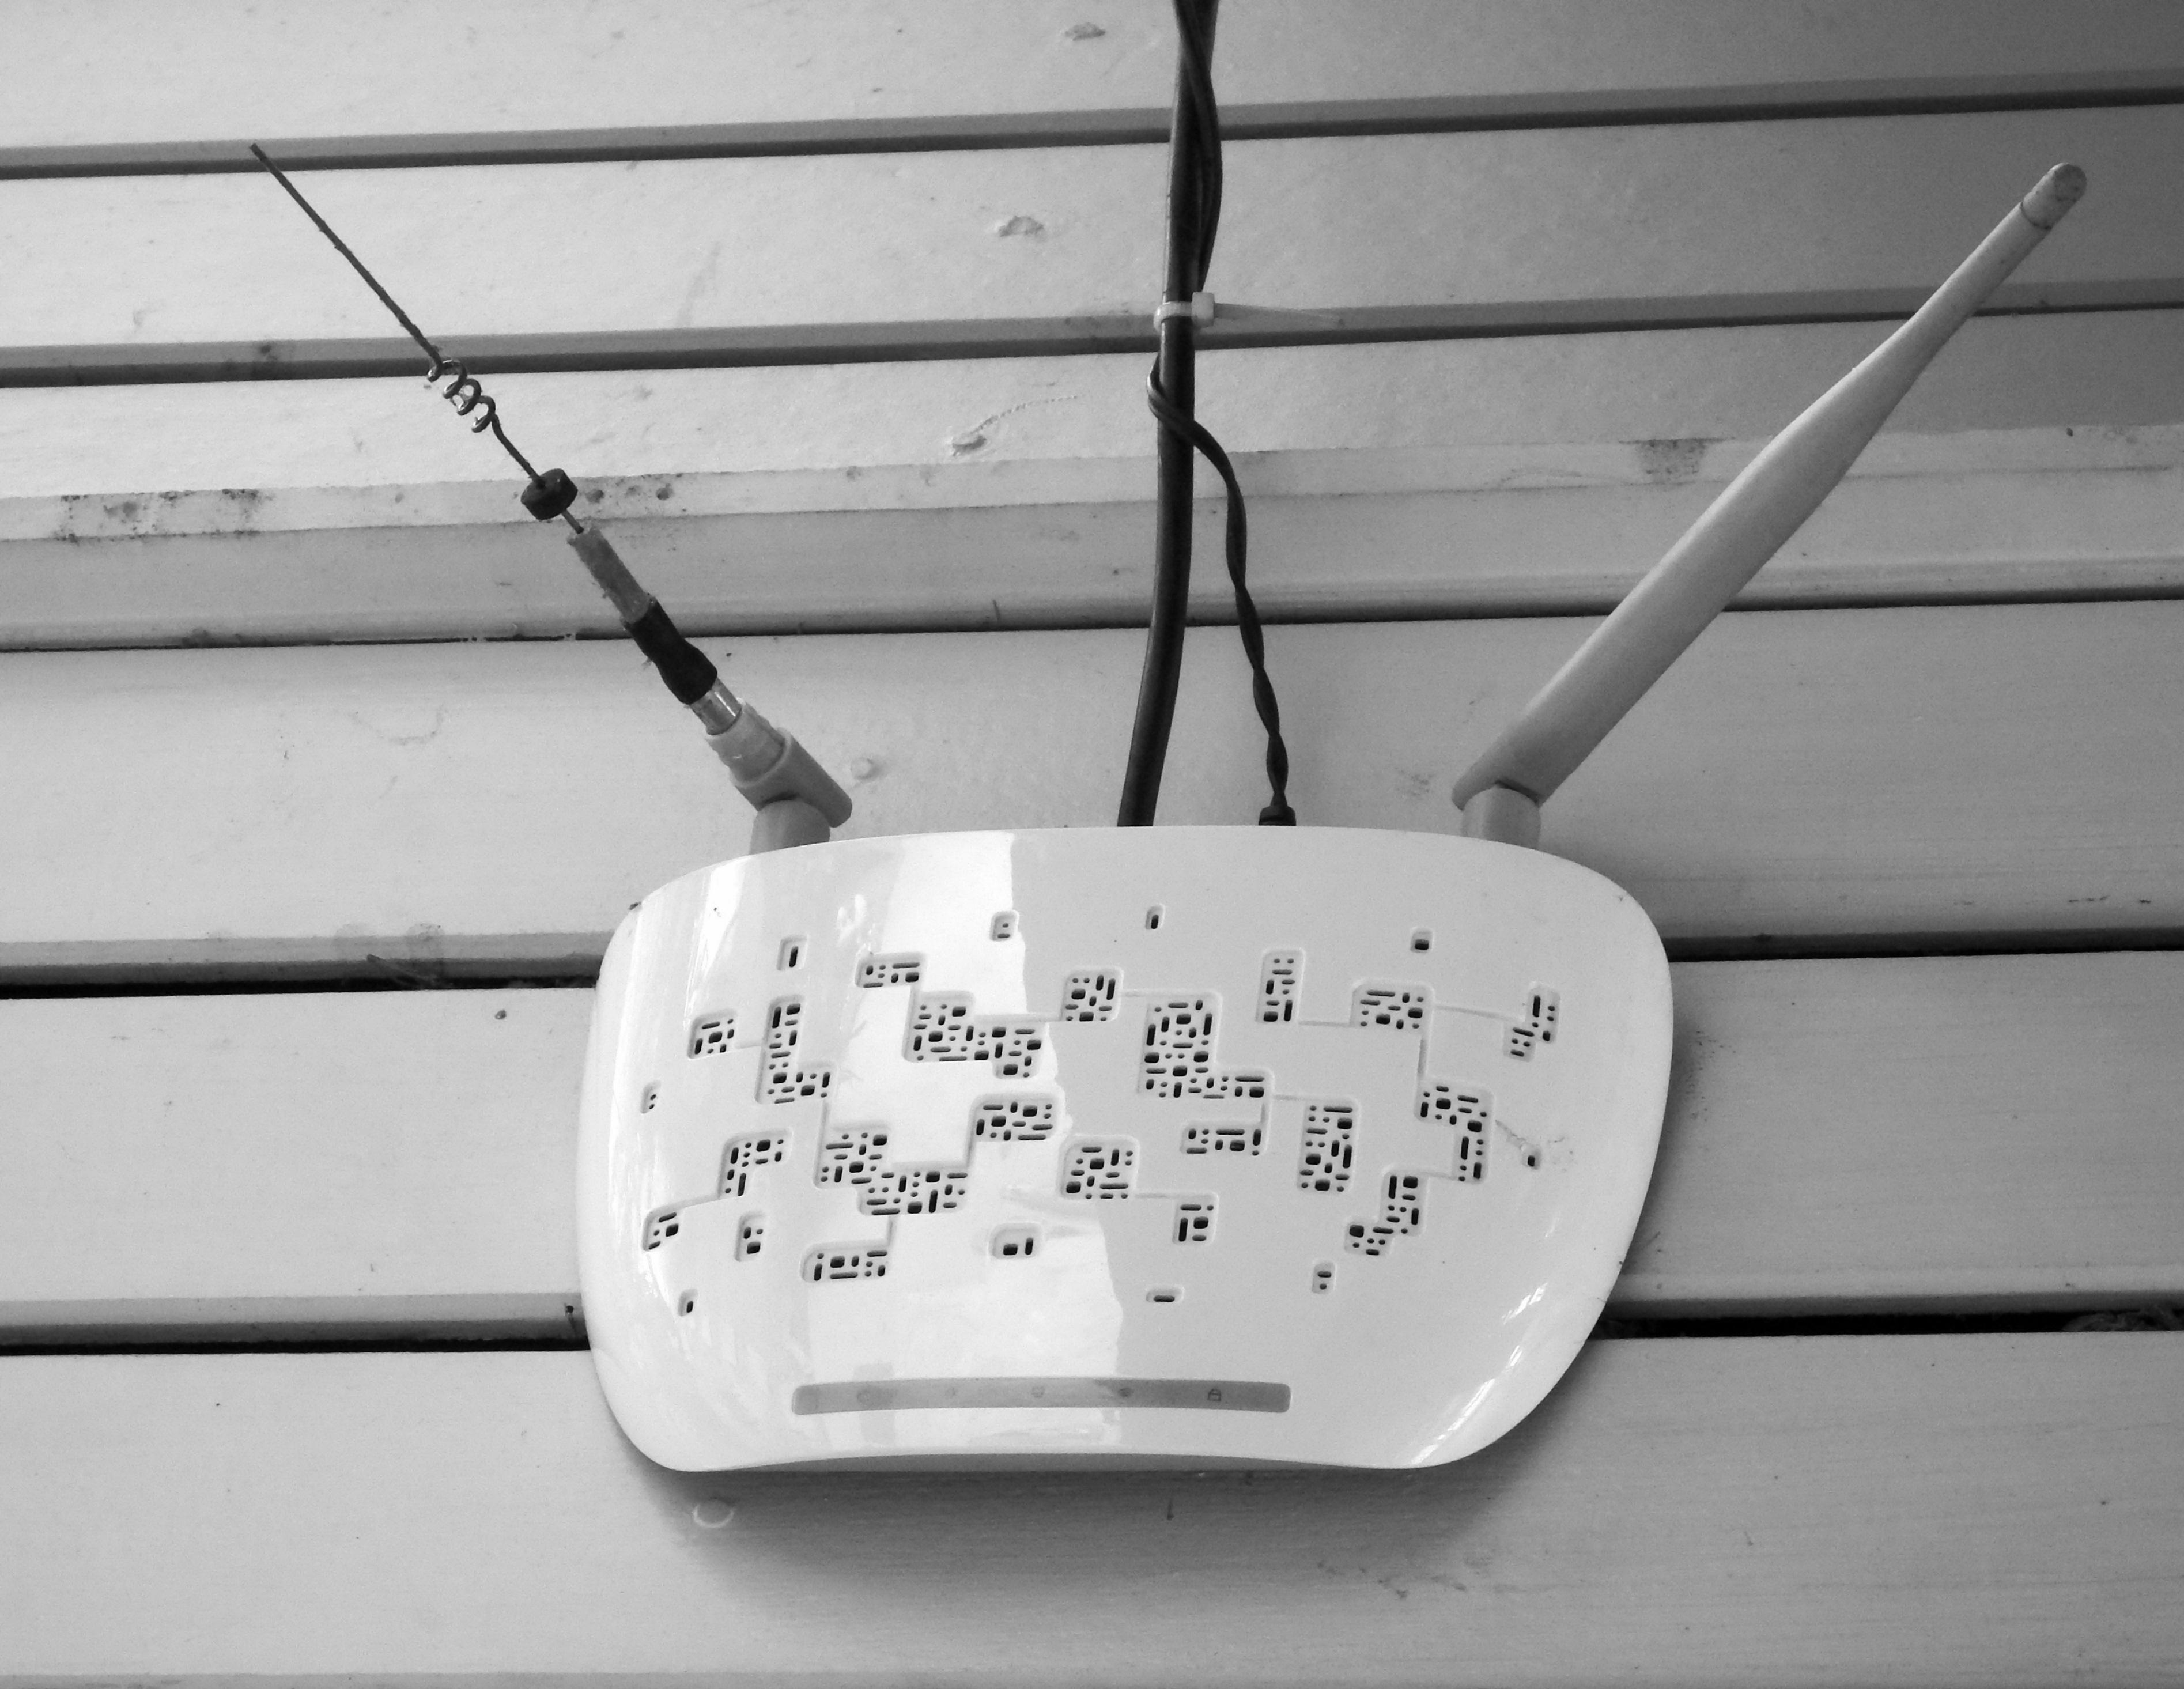 Wi-fi Internet Router, Aerial, Room, Wifi, Wi-fi, HQ Photo